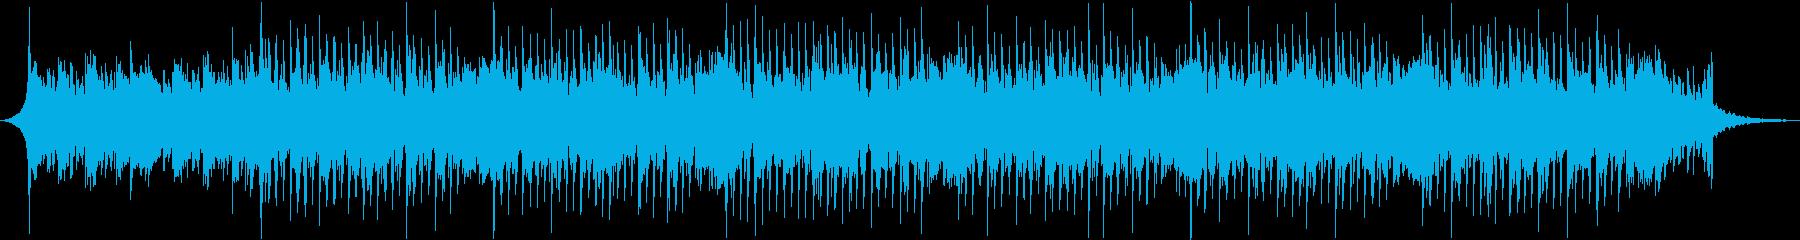 Corporate Synth 150の再生済みの波形